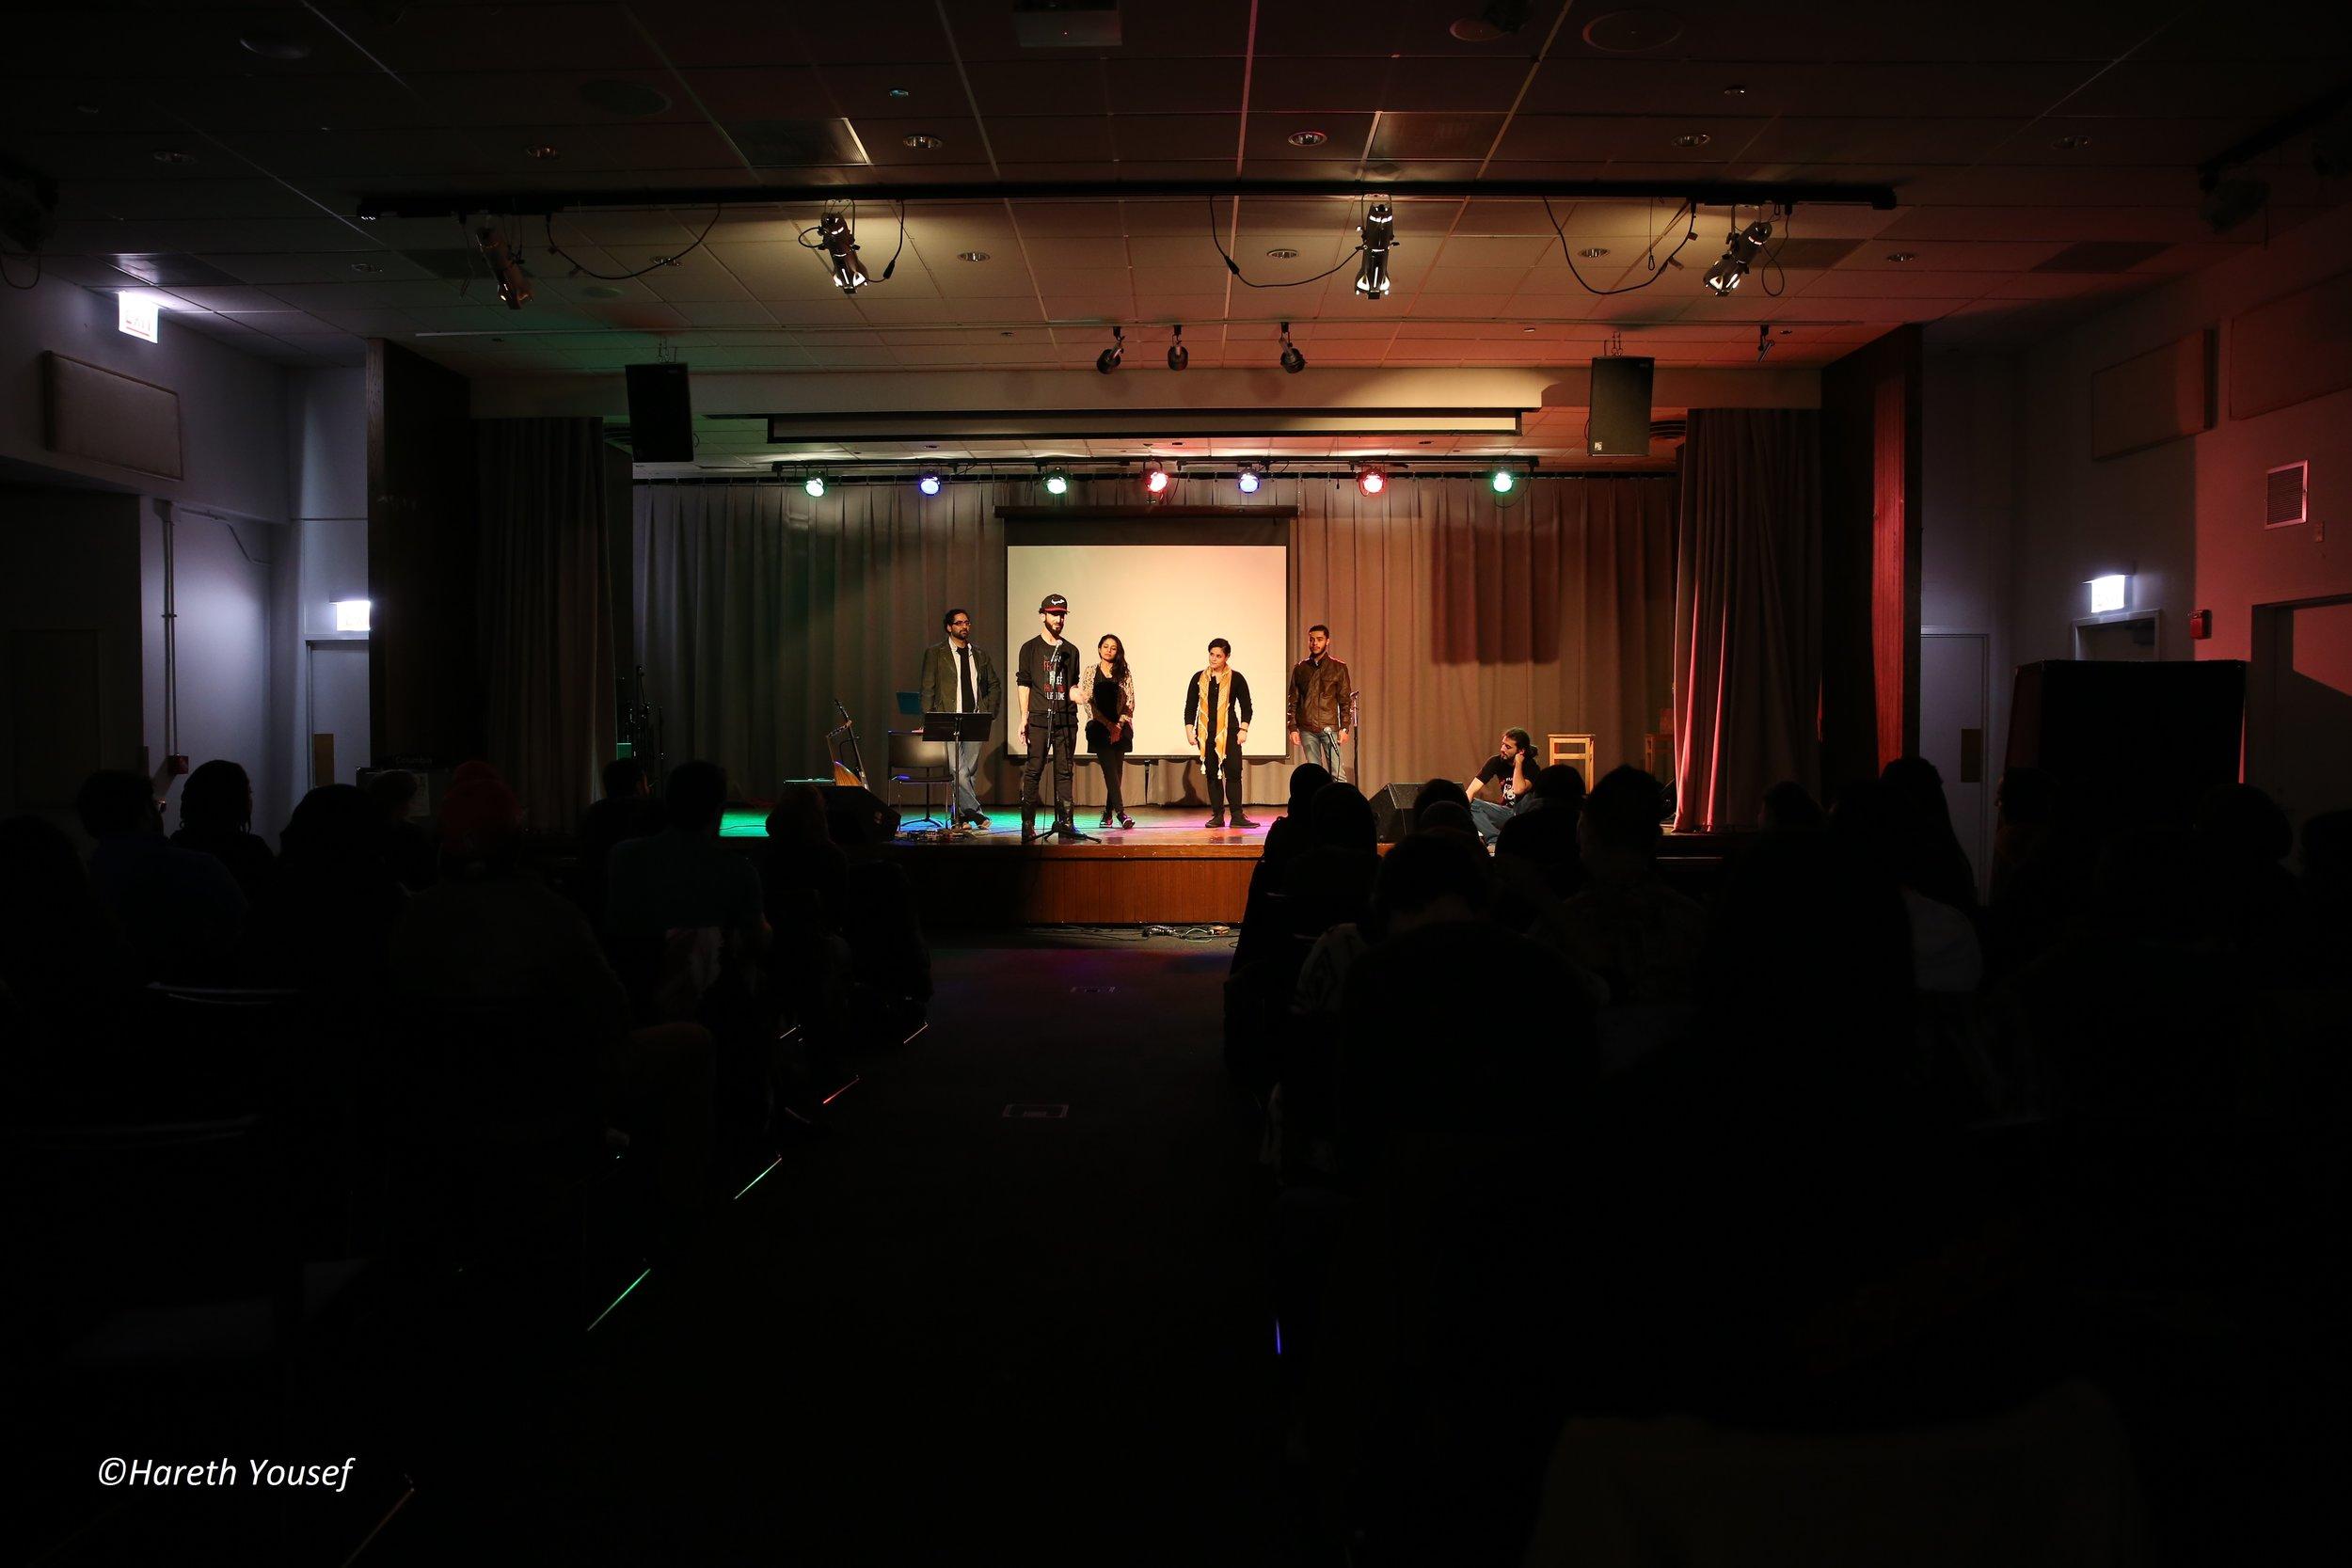 20151209_hy_sjp_event-29.jpg